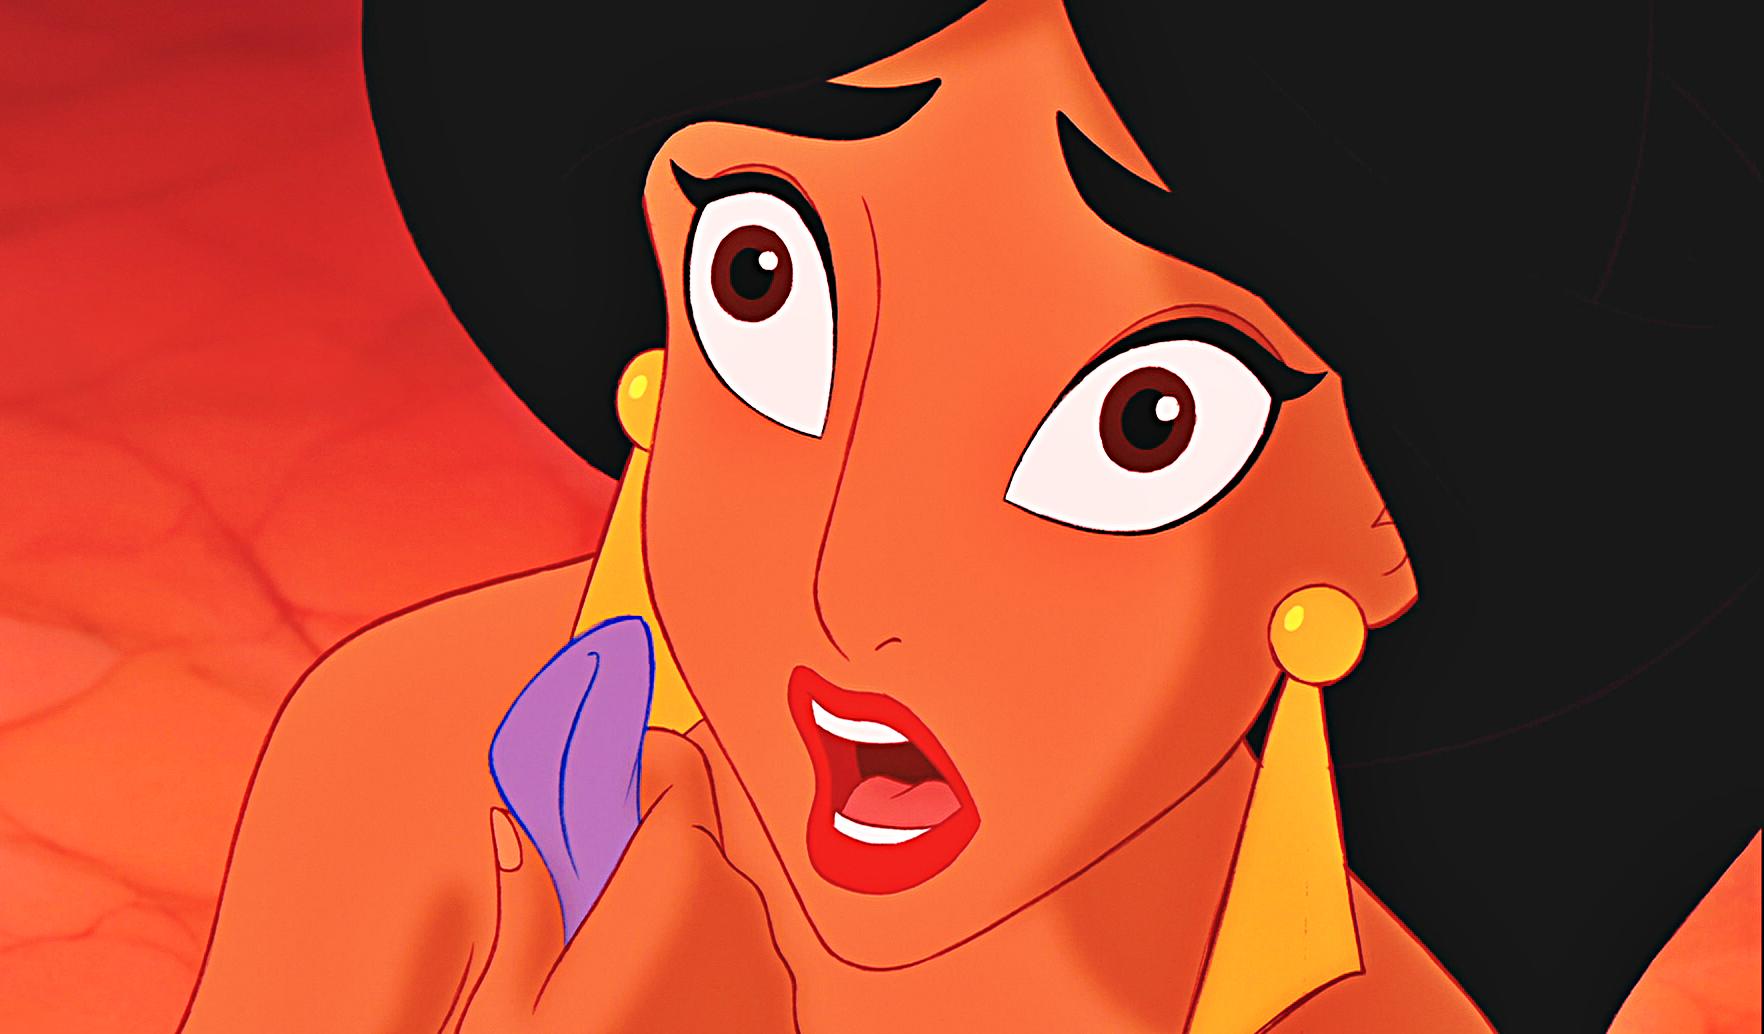 Walt 디즈니 - Princess 재스민 속, 재 스민